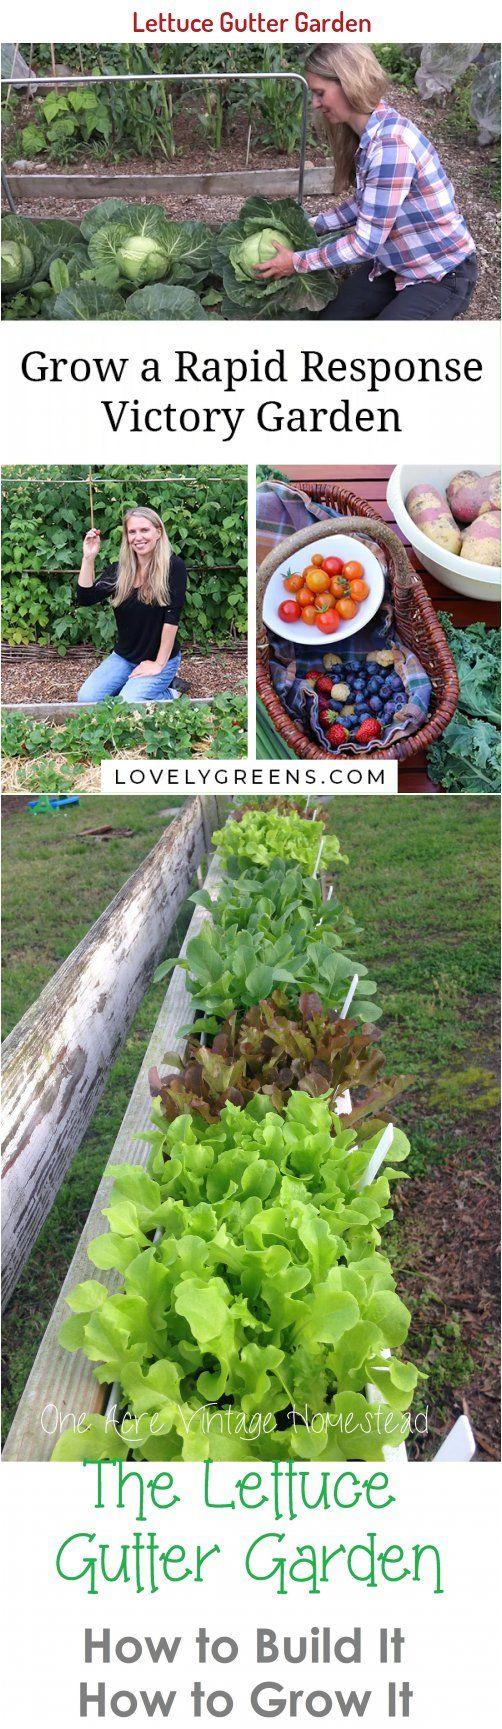 Lettuce Gutter Garden How To Build It How To Grow It One Acre Vintage Homestead In 2020 Gutter Garden Planting Vegetables Soil